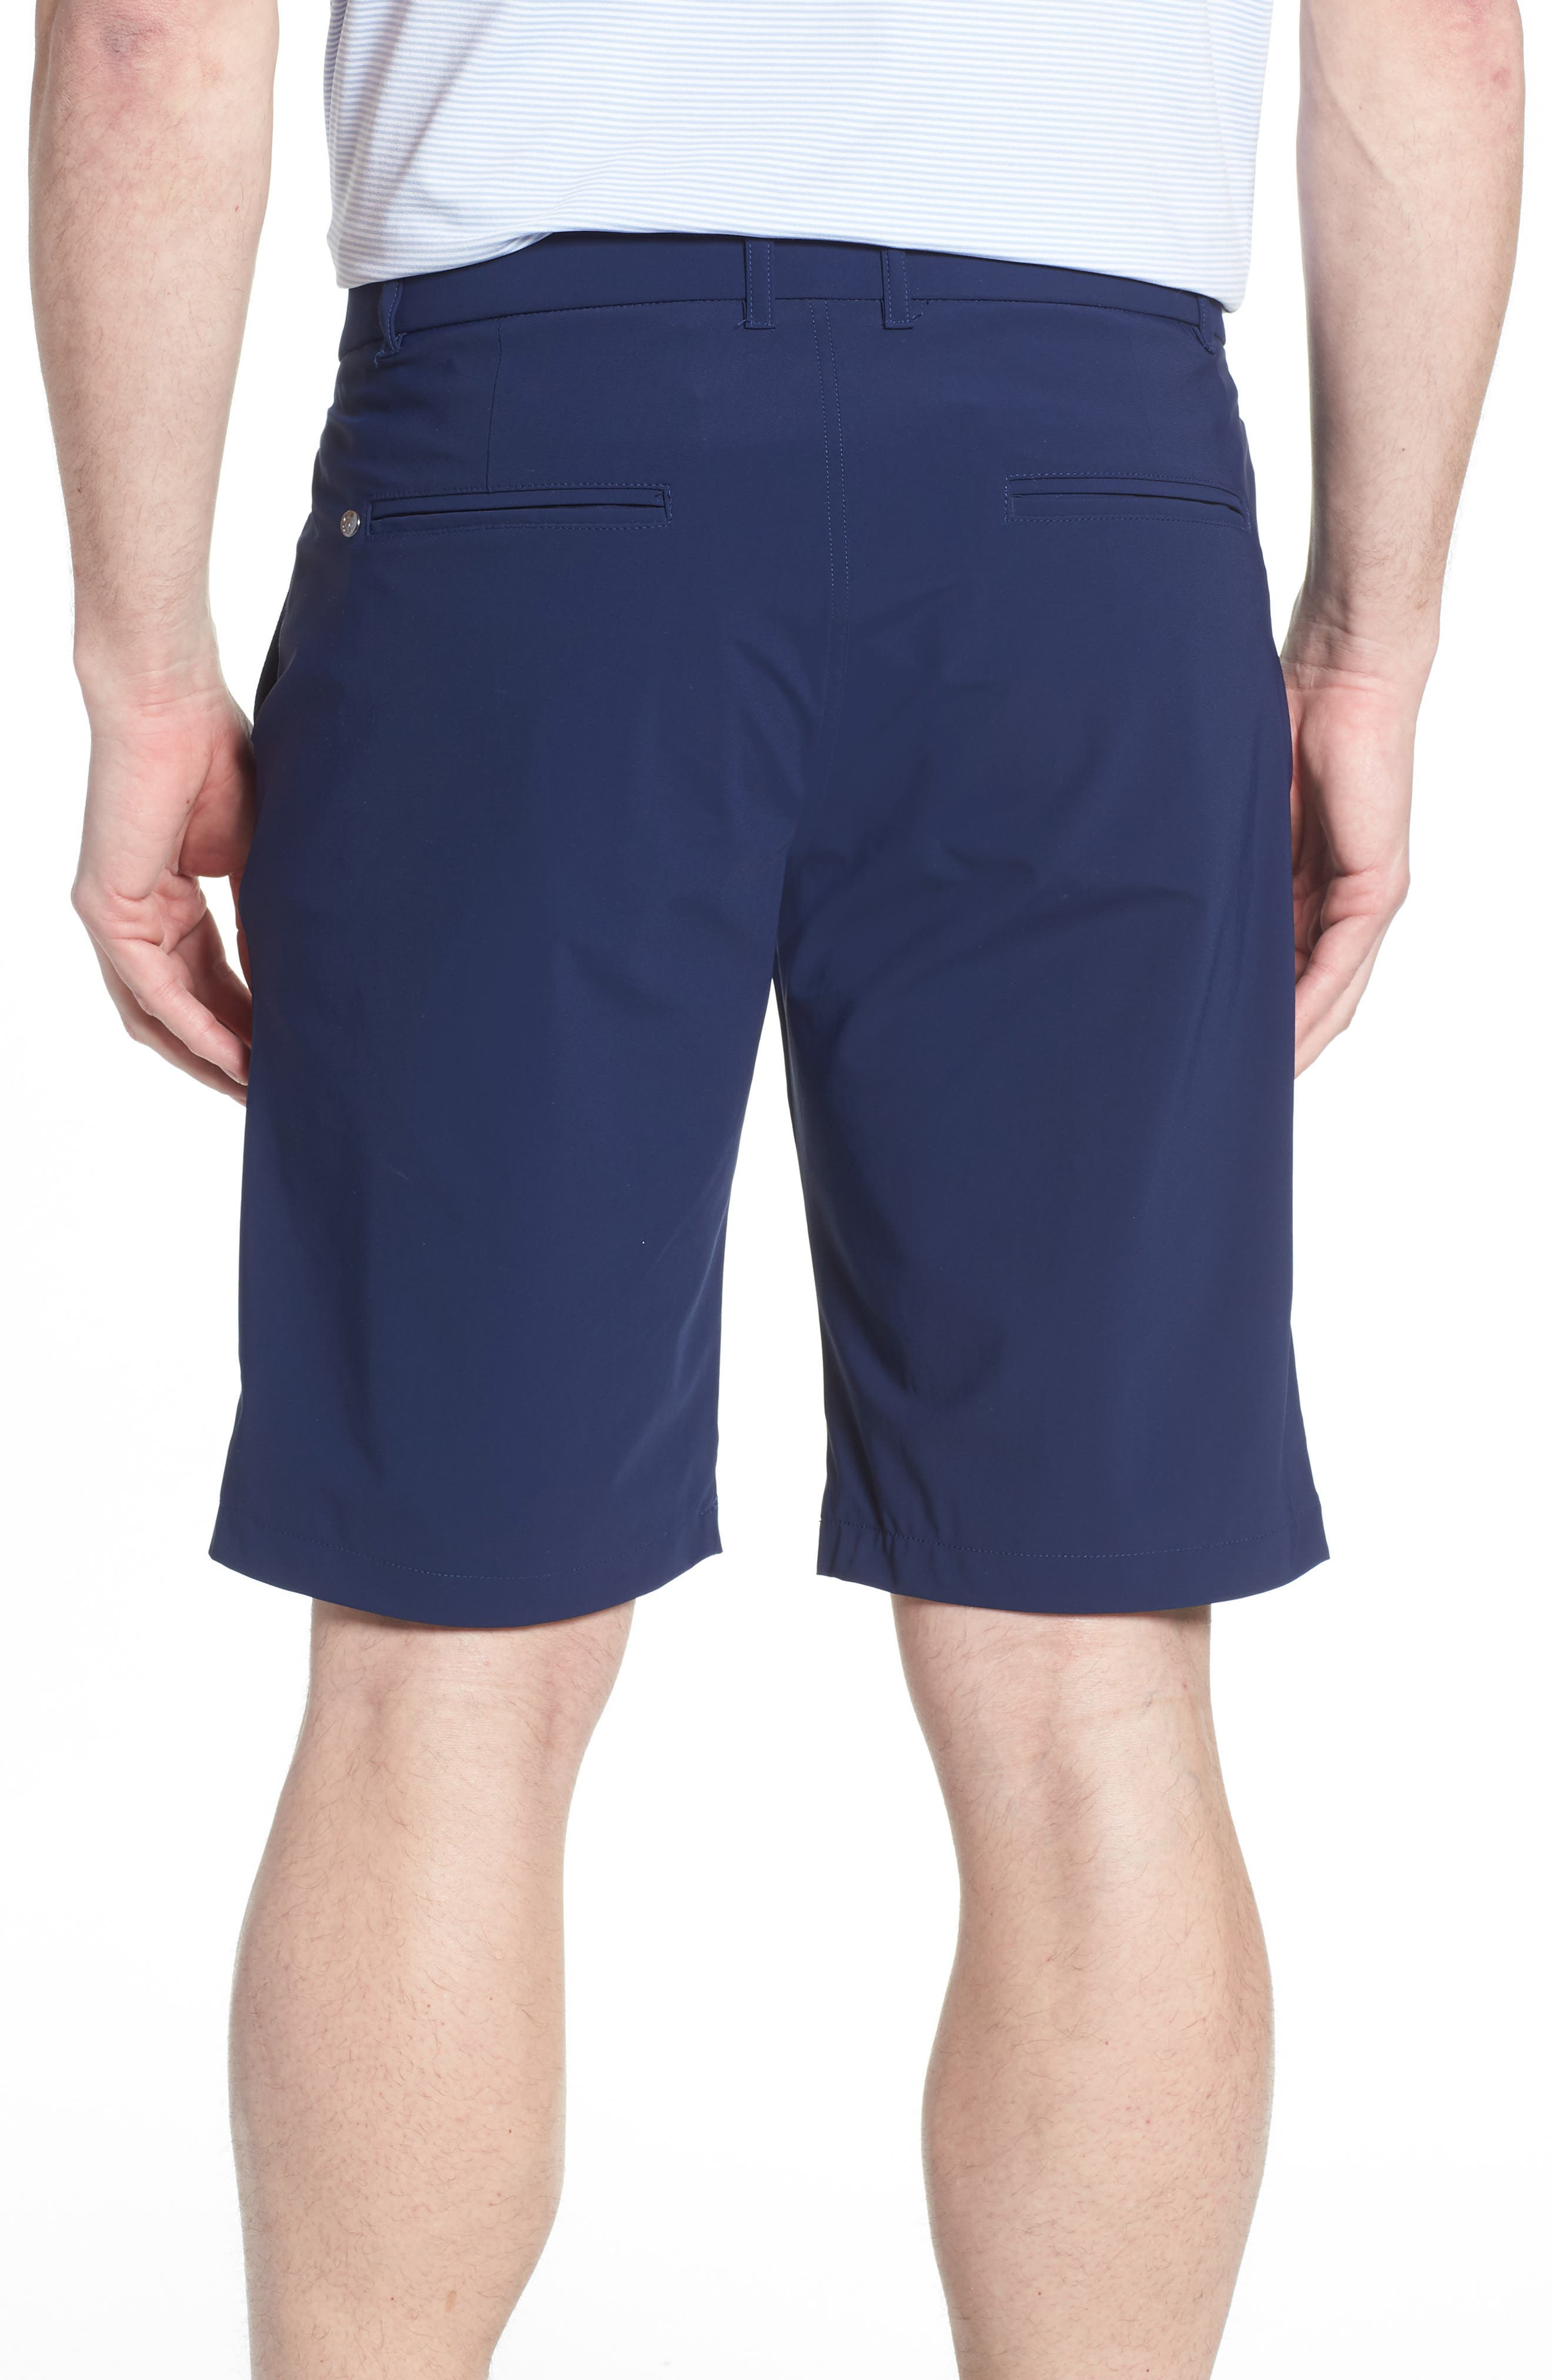 Montauk Shorts,                             Alternate thumbnail 2, color,                             Maltese